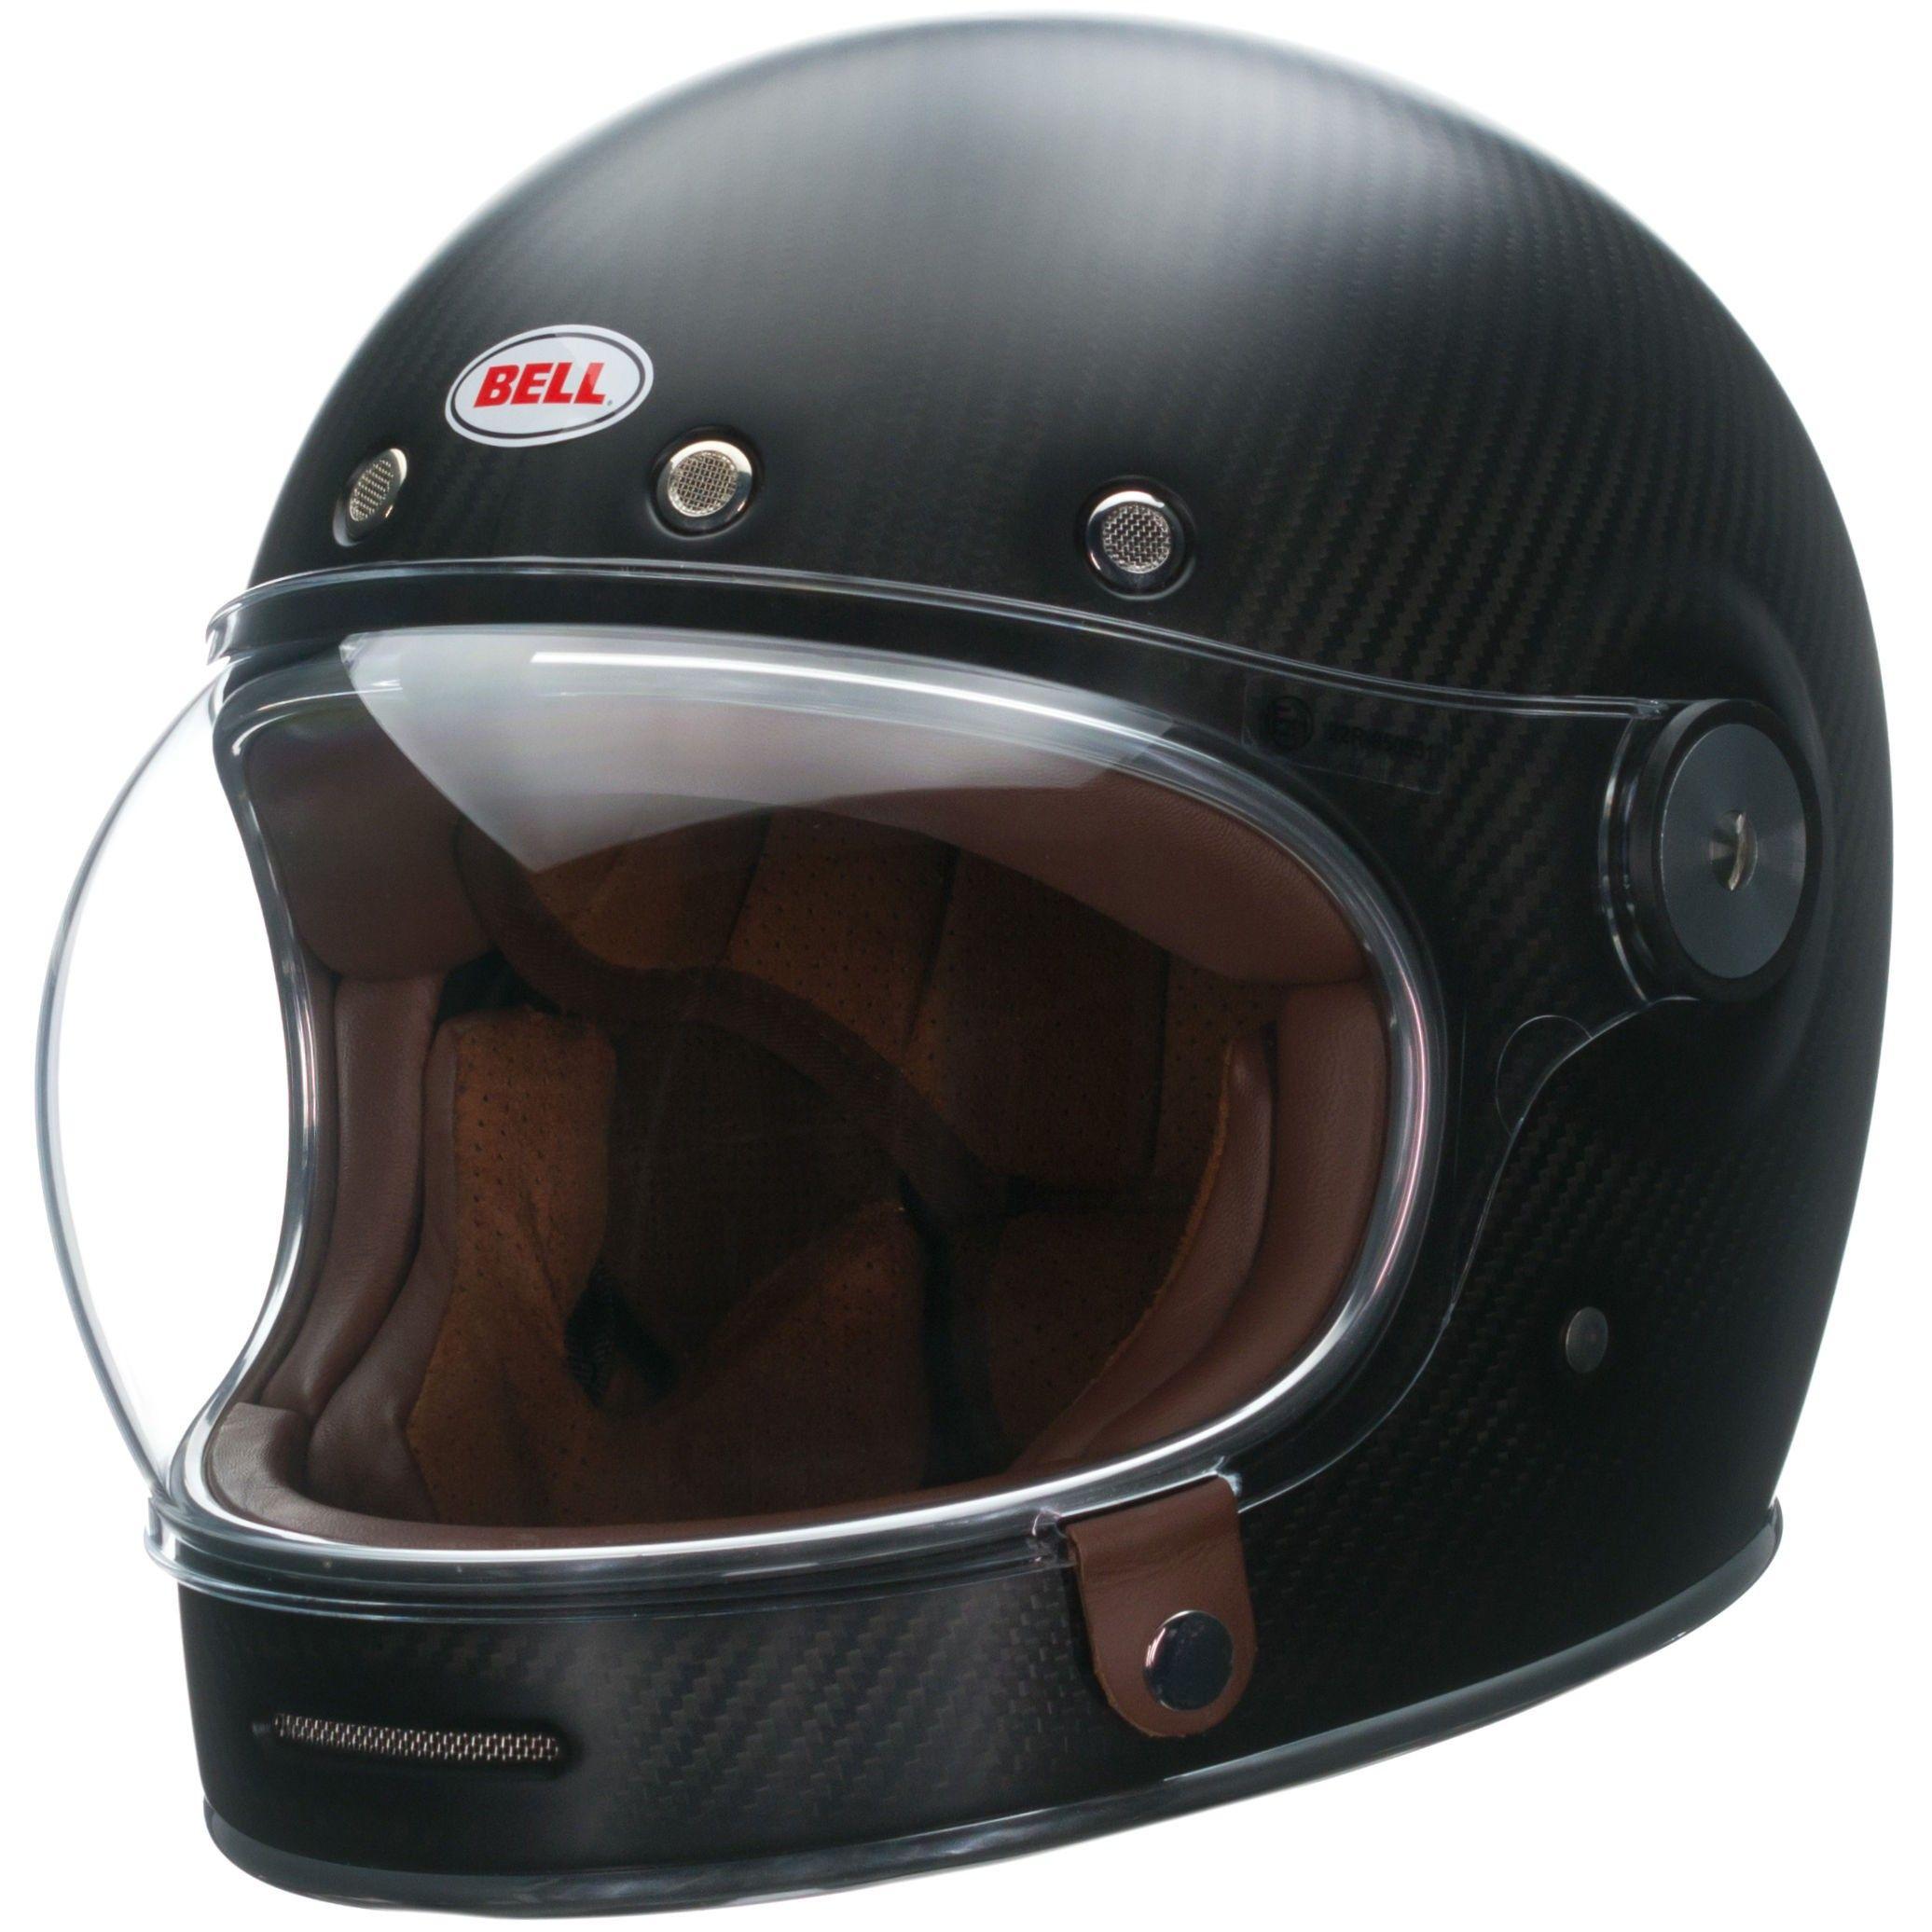 Bell Bullitt Carbon Helmet Casque Vintage Casque Bell Casque Moto Vintage